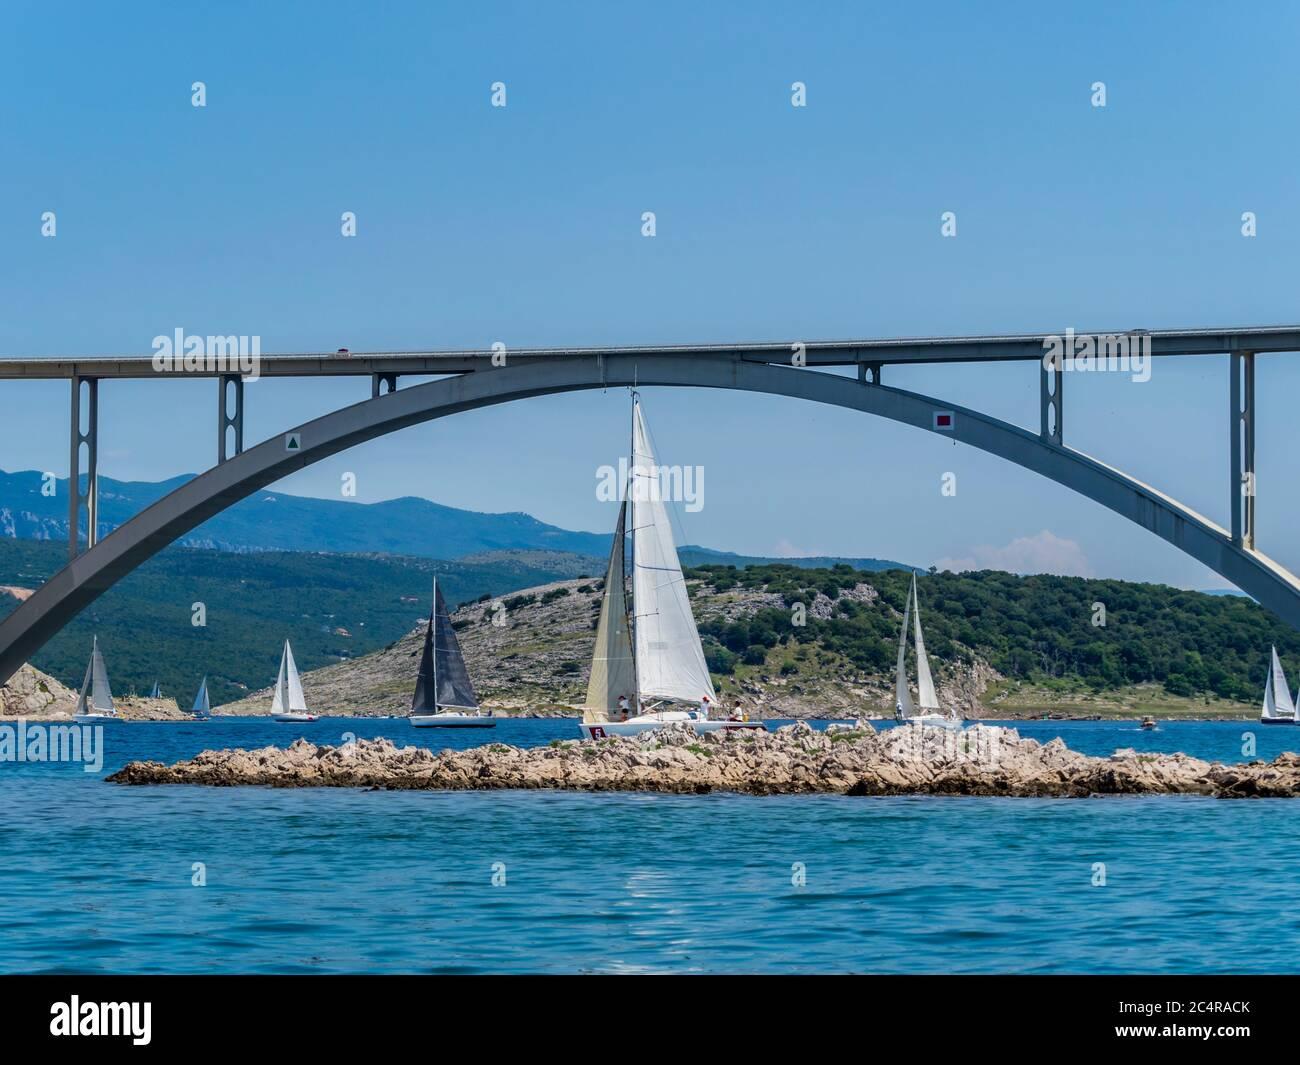 Sailboats vessel boat ship under sail behind small island near bridge Krk in Croatia Europe Stock Photo